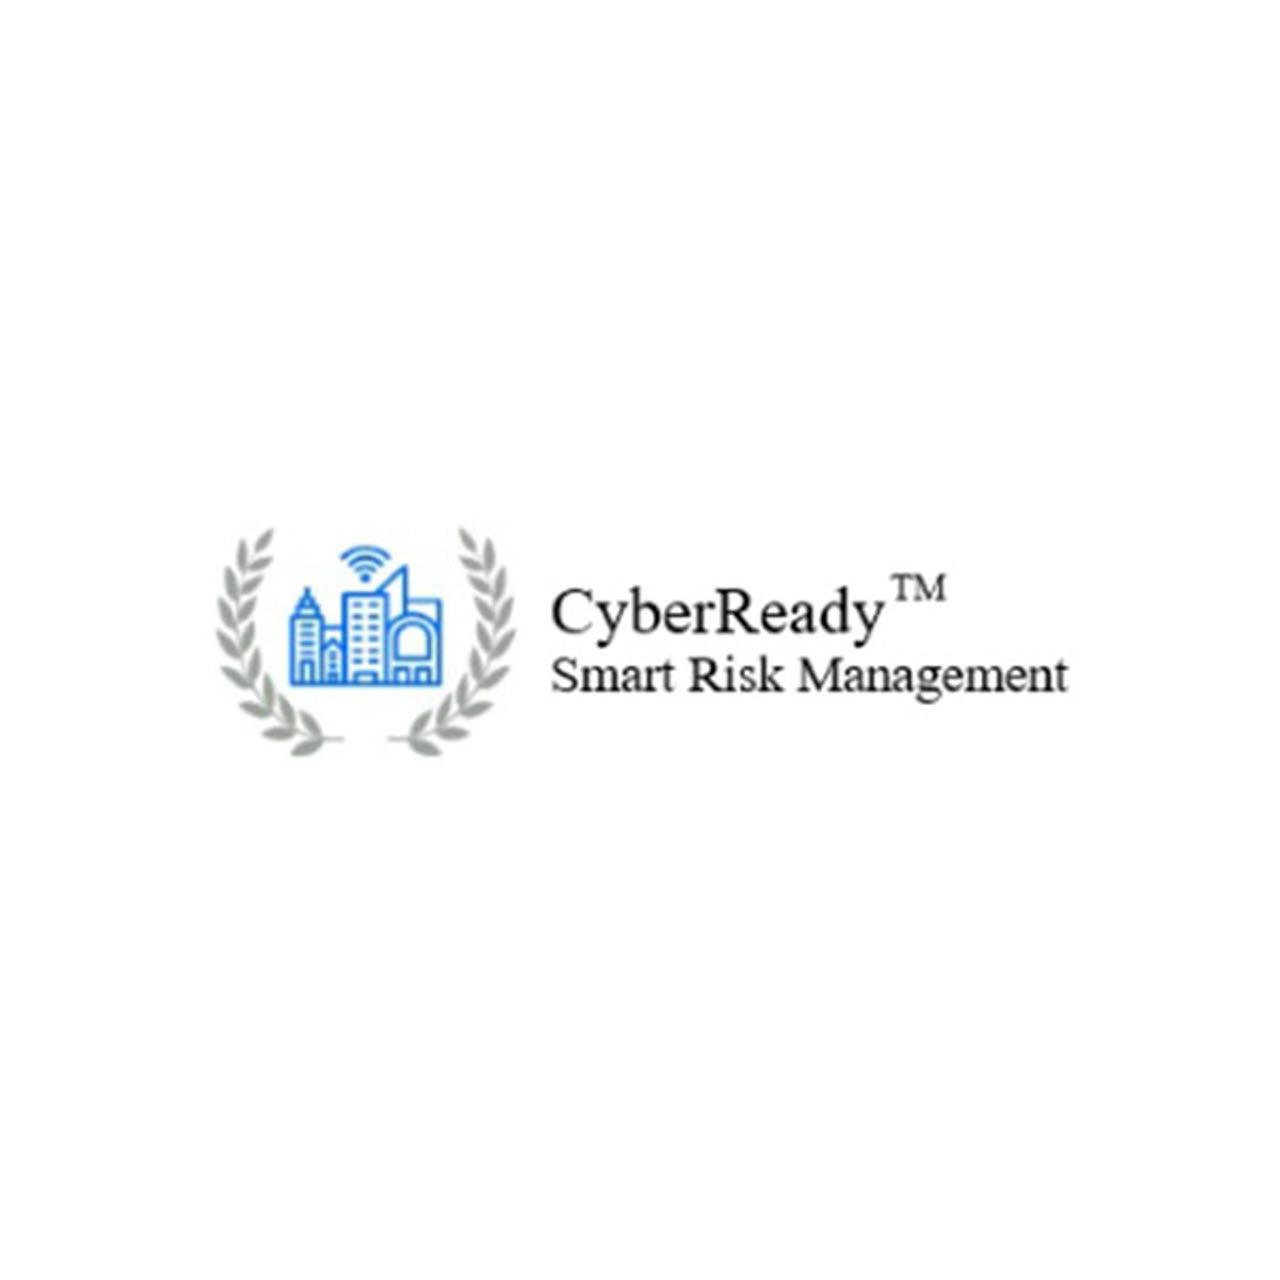 CyberReady.jpg